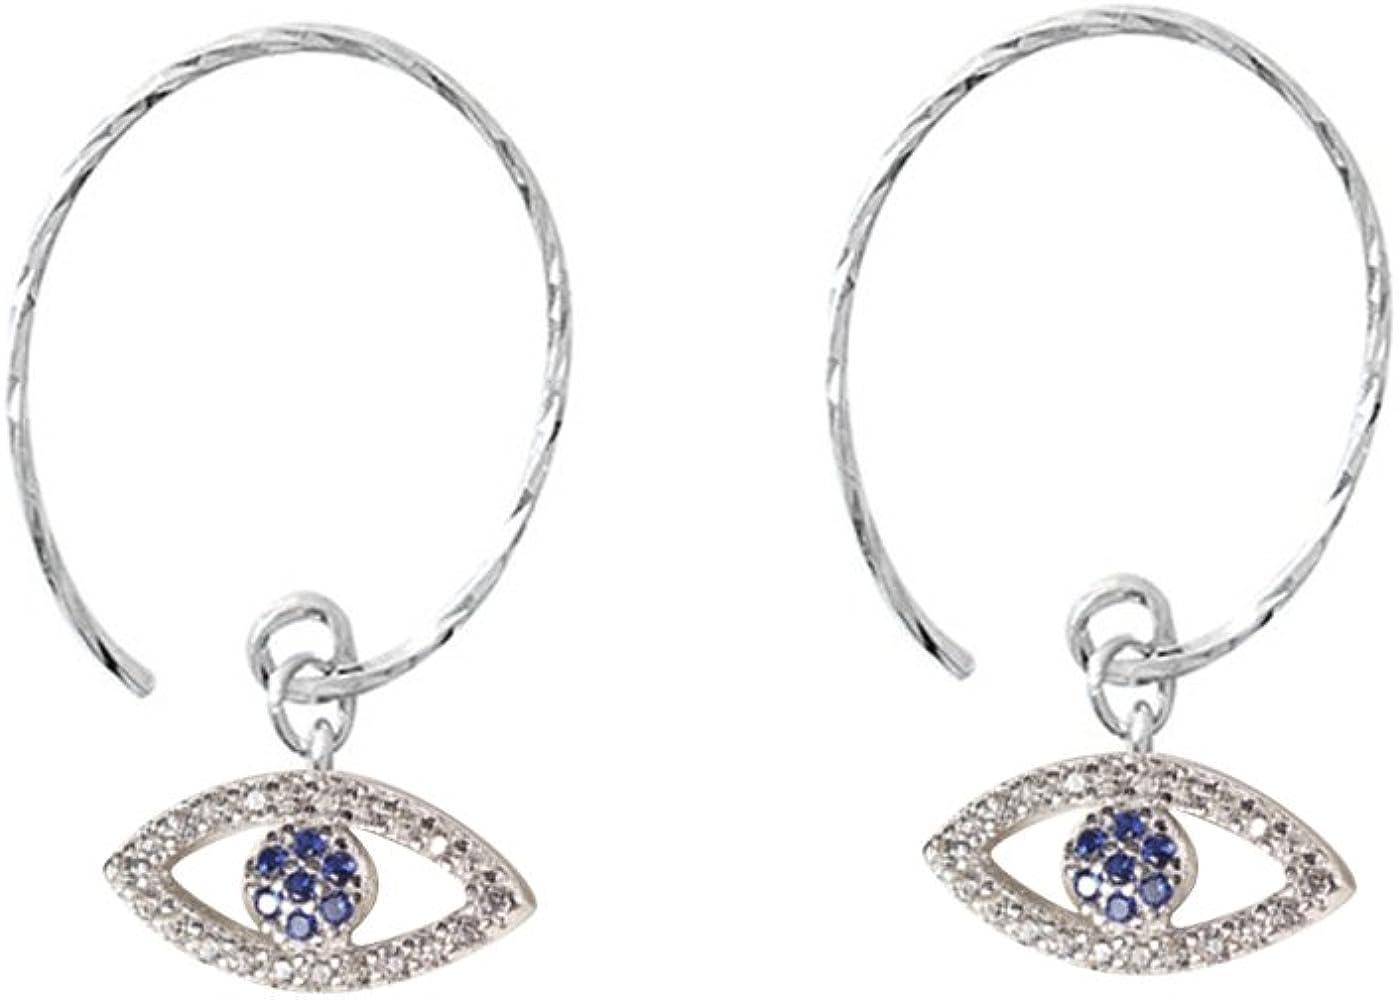 earring hooks are sterling silver 925 Evil Eye Dangle wrapped seed bead earrings